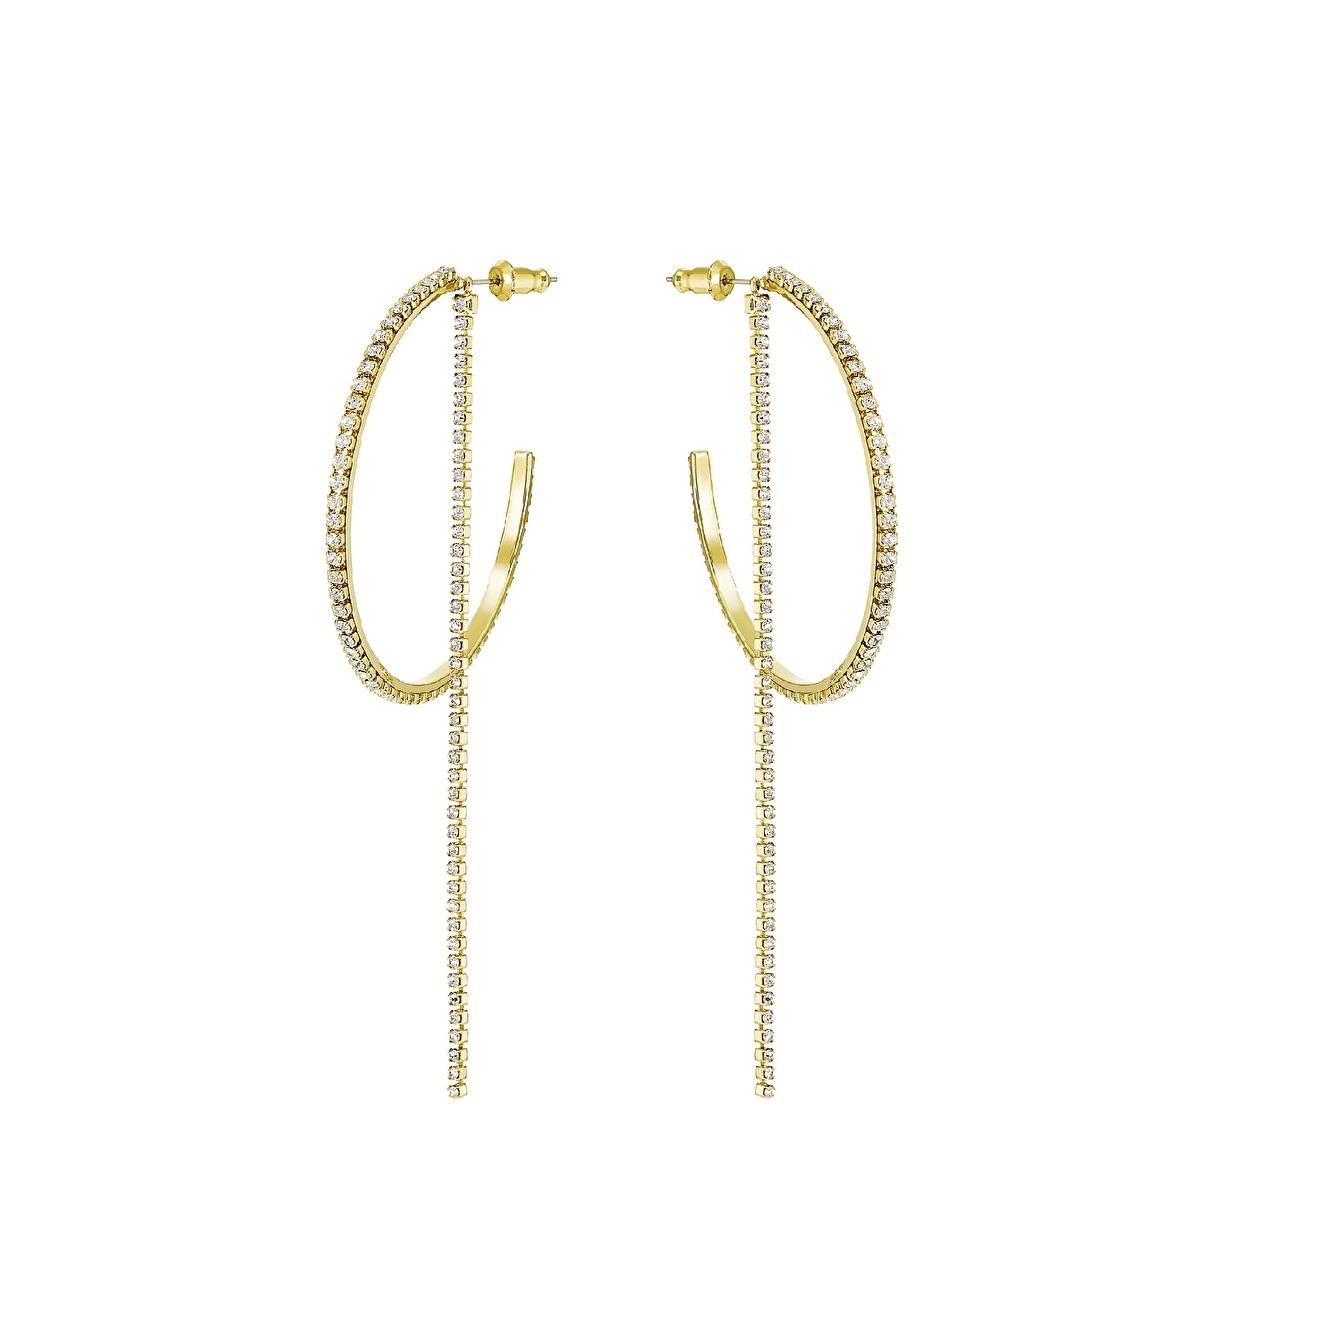 Swarovski Большие позолоченные серьги-кольца FIT кольца swarovski 5424994